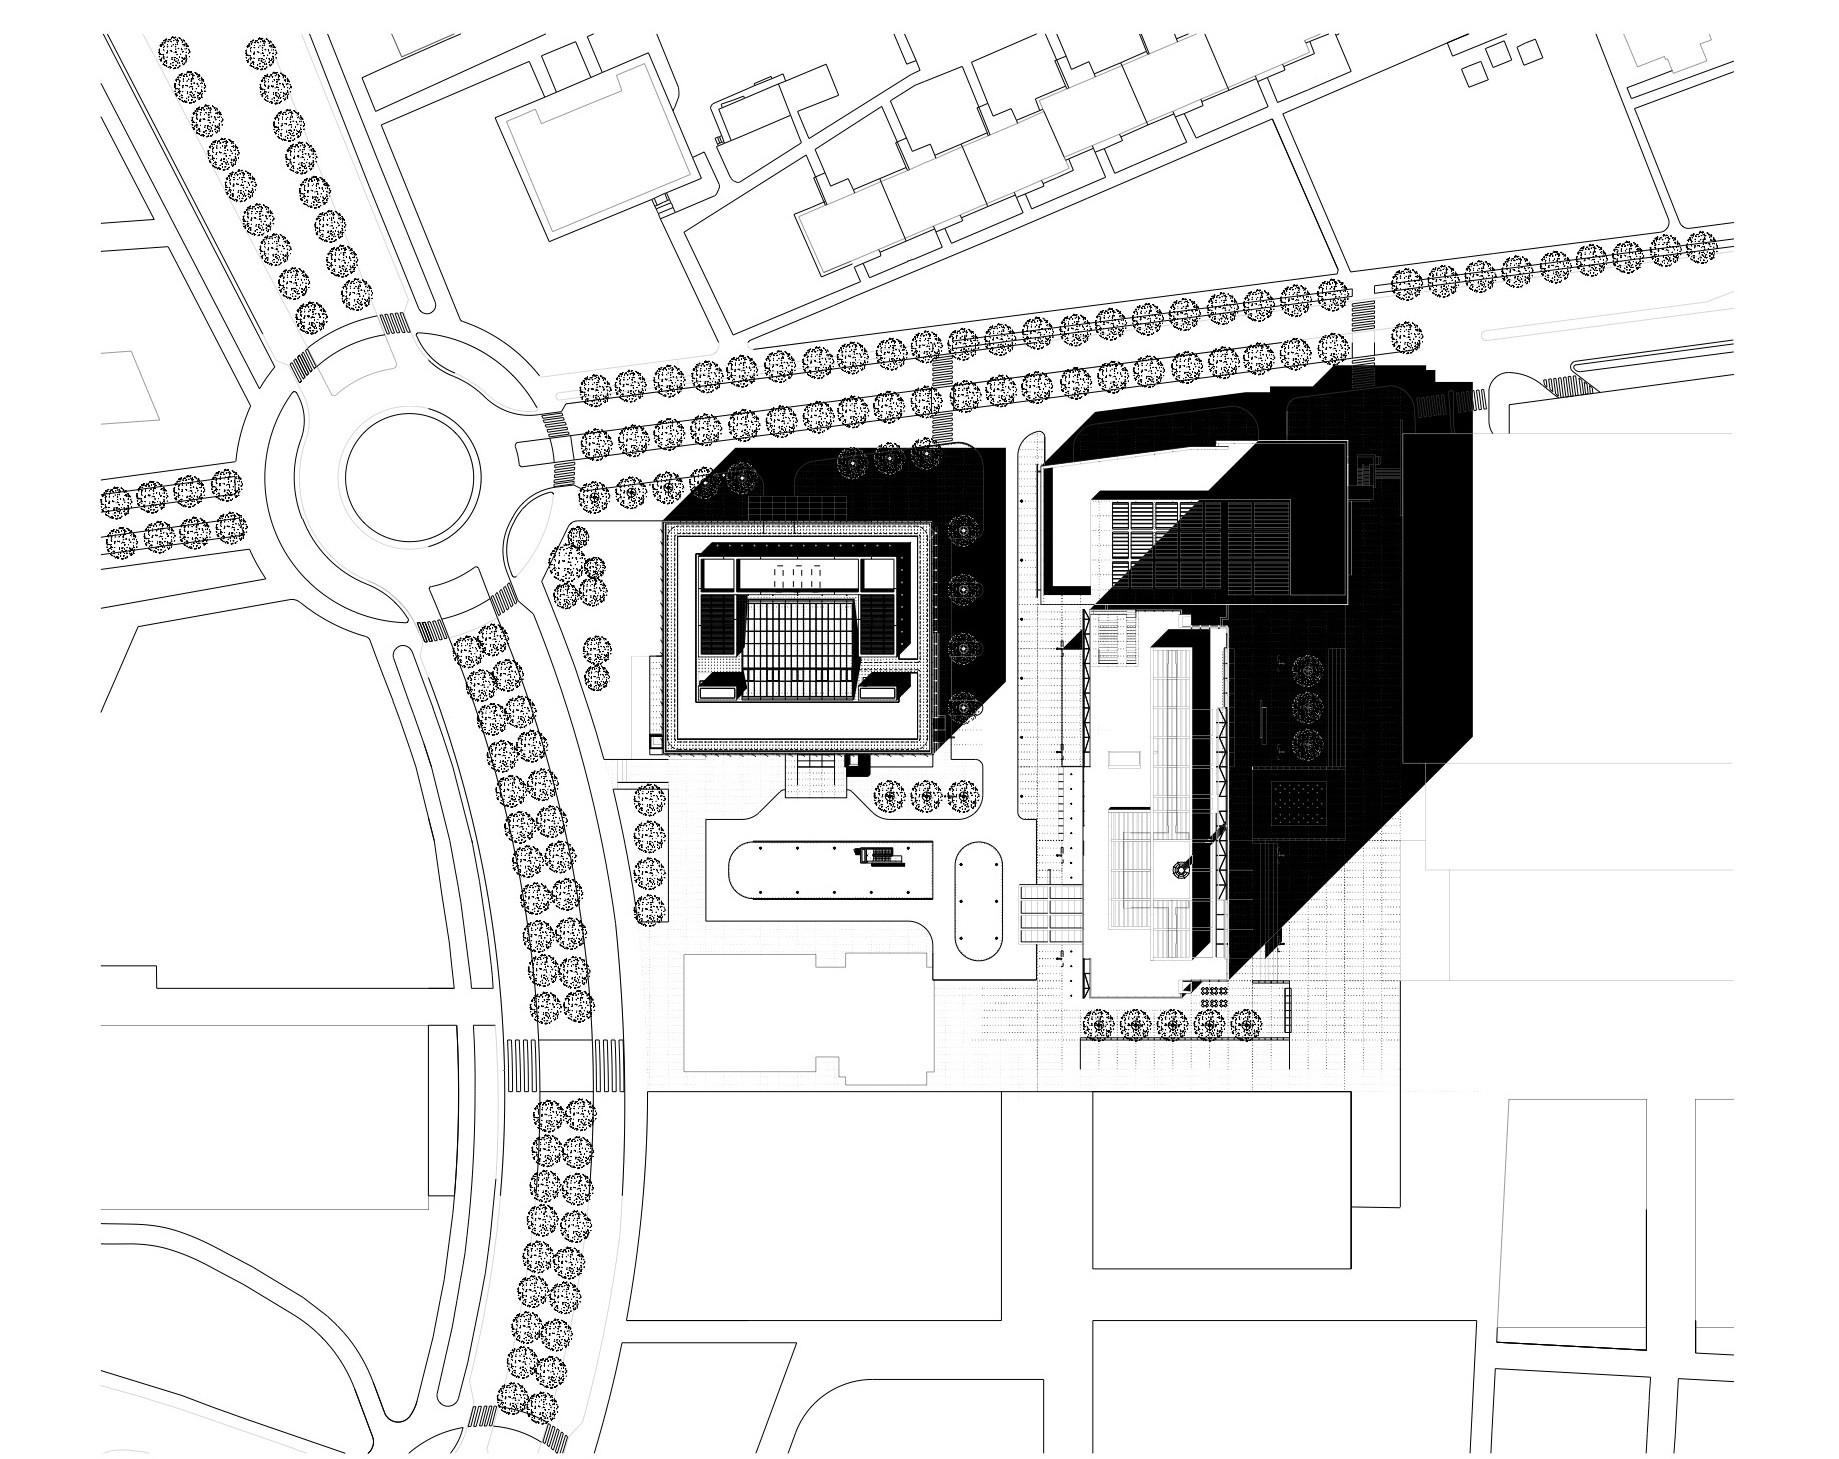 City Green Court / Richard Meier & Partners